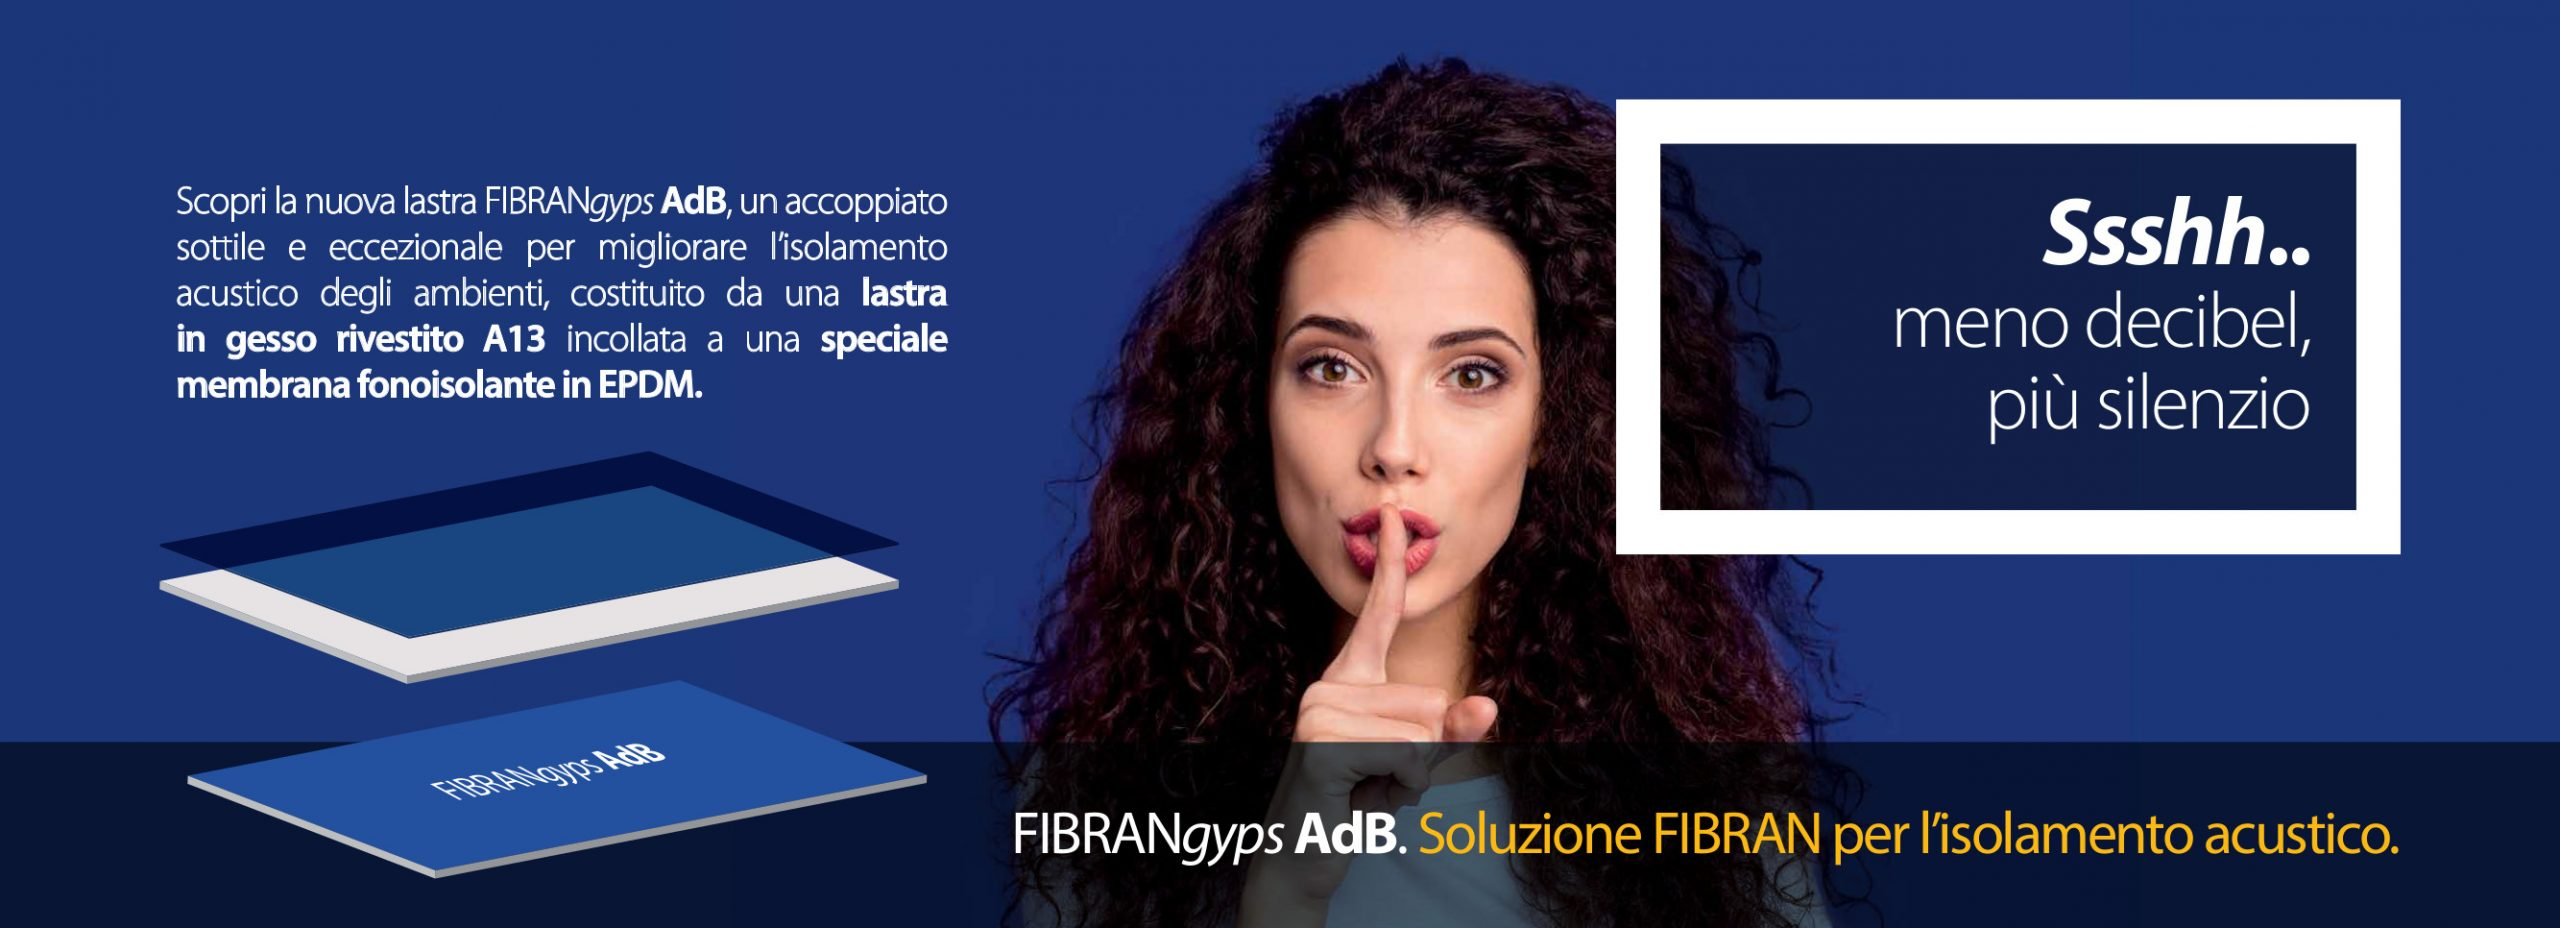 FibrangypsAdb